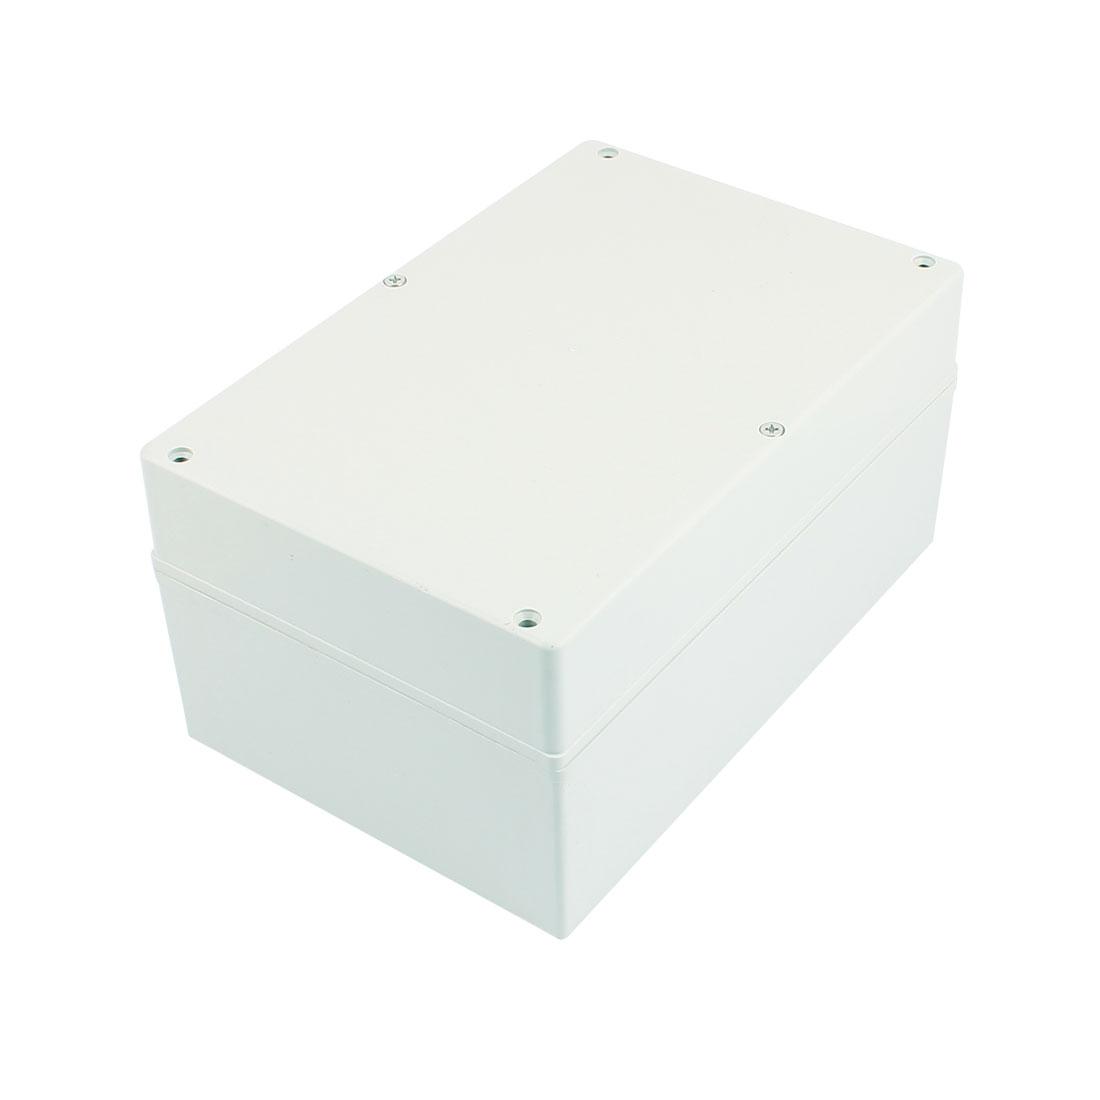 Dustproof IP65 Junction Box DIY Terminal Connection Enclosure Adaptable 232mm x 152mm x 112mm